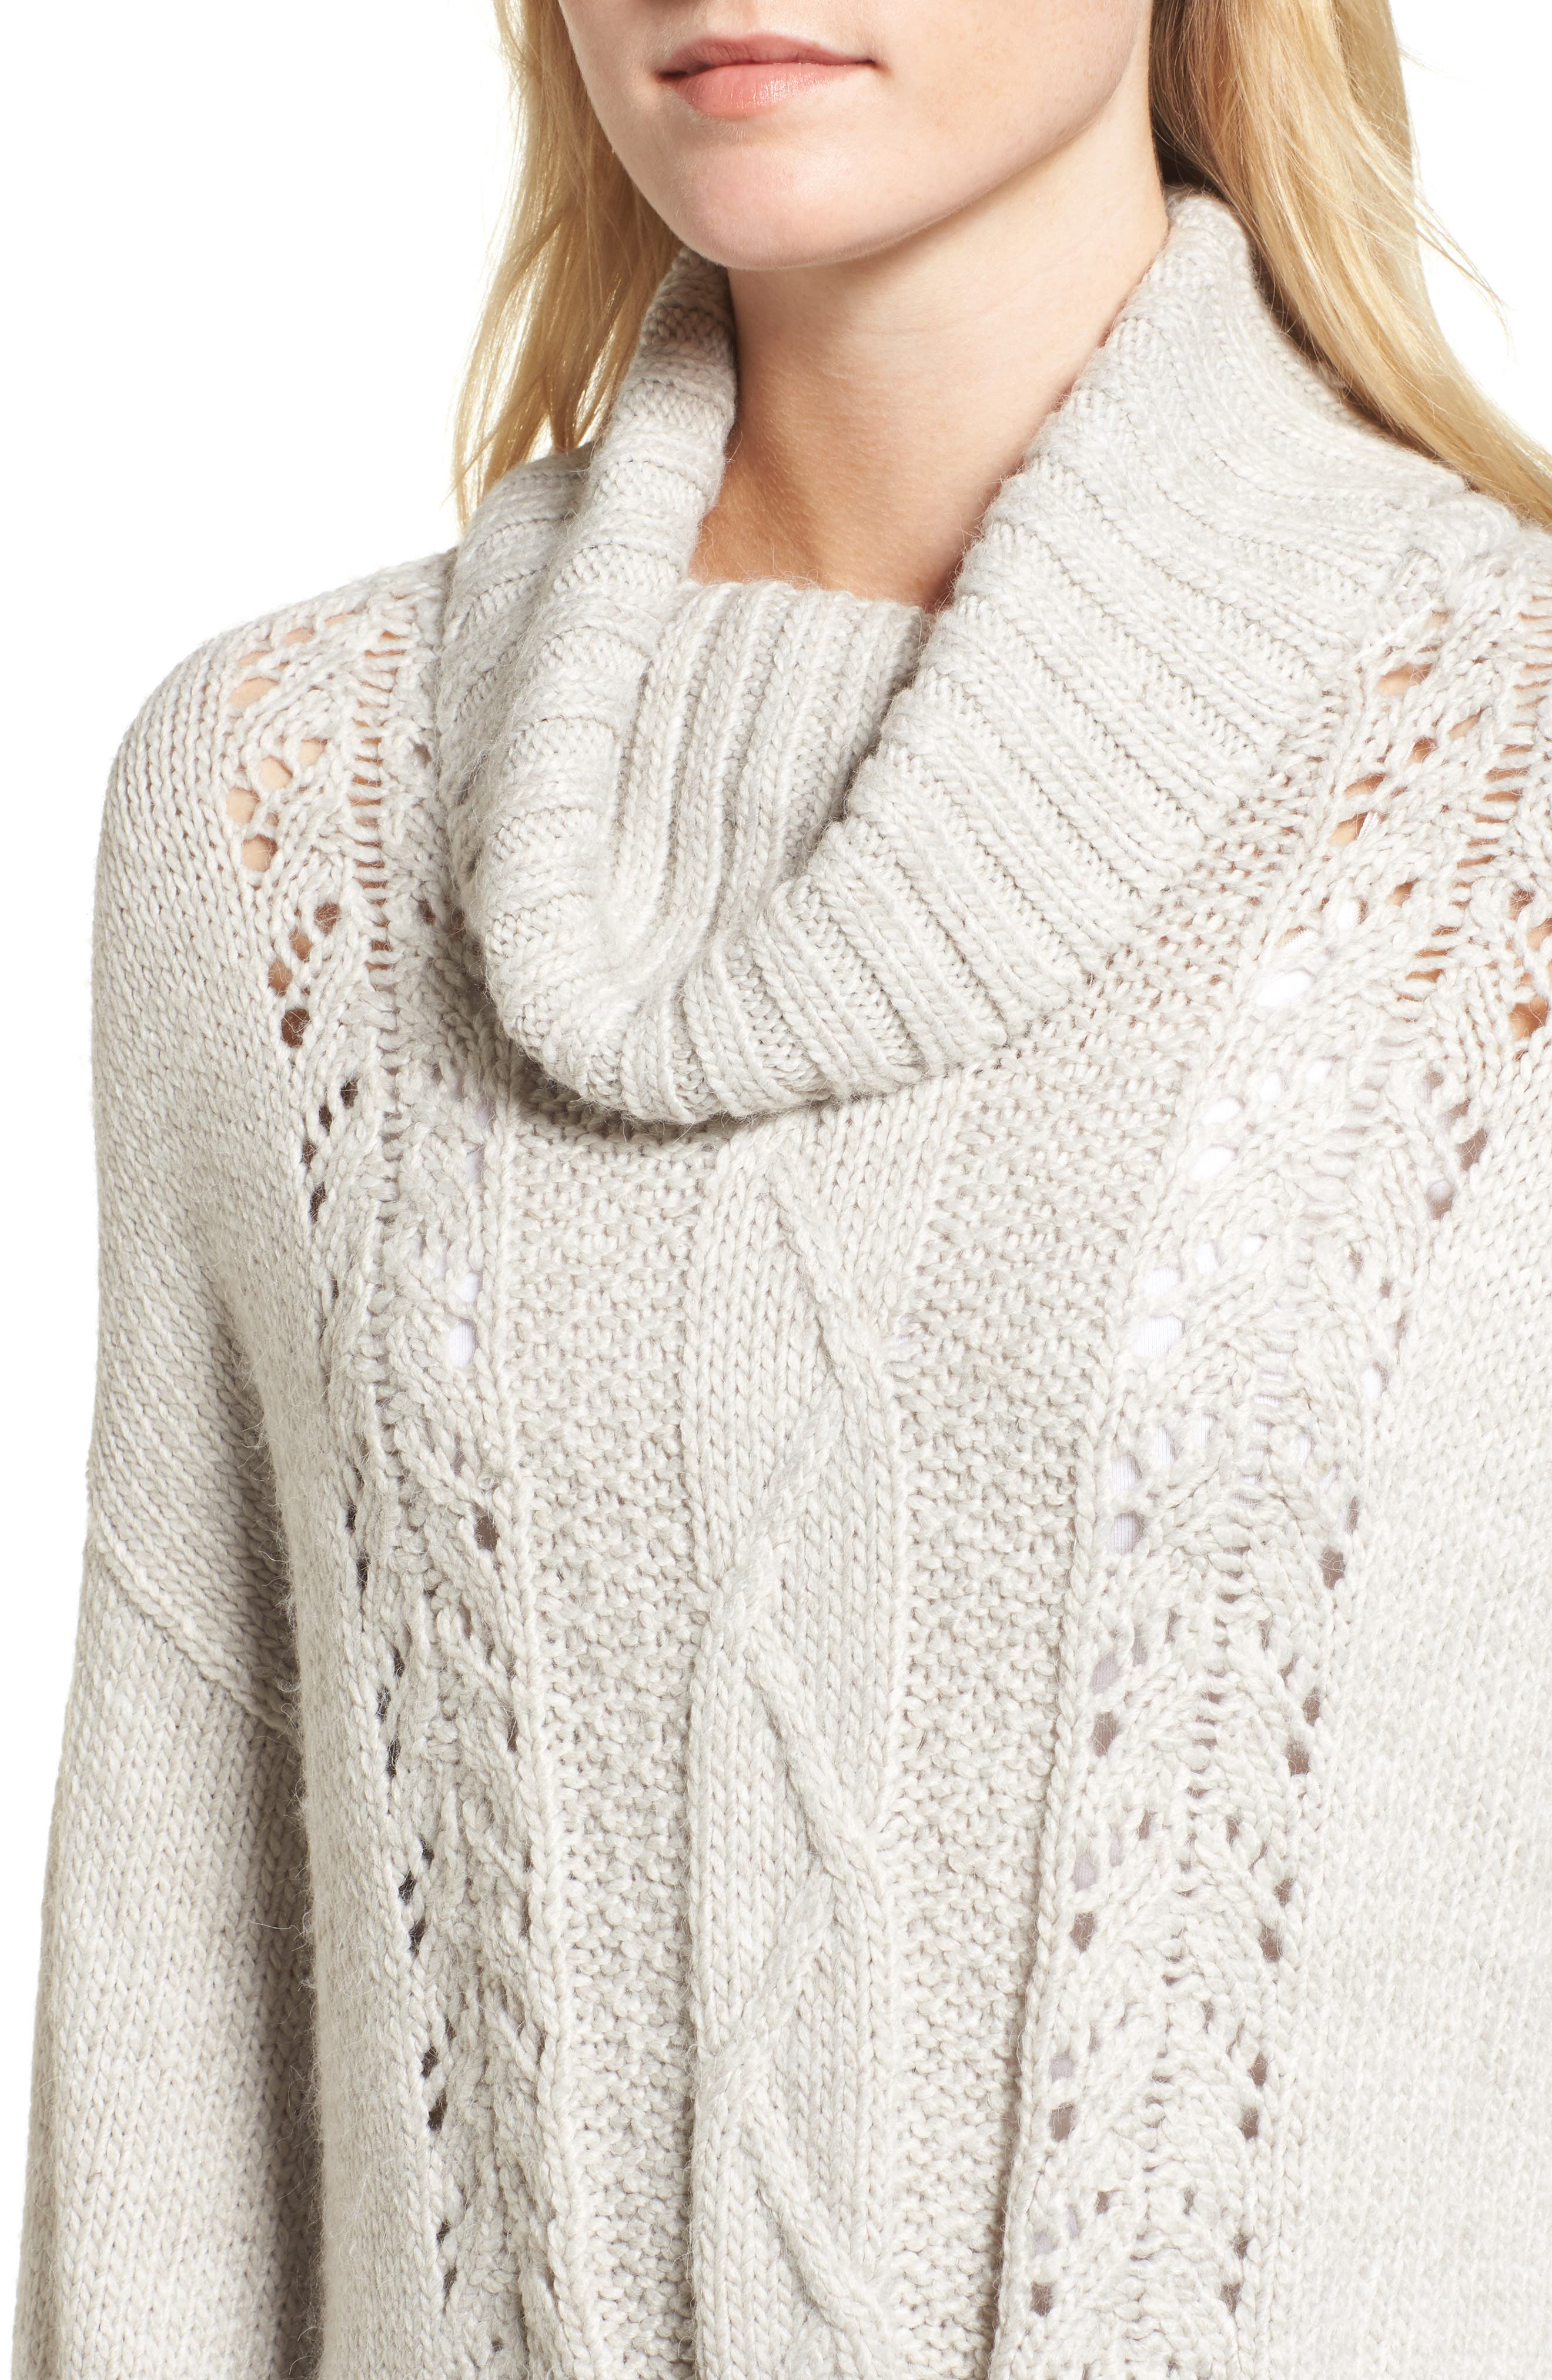 Prilla Fringe Cowl Neck Sweater,                             Alternate thumbnail 4, color,